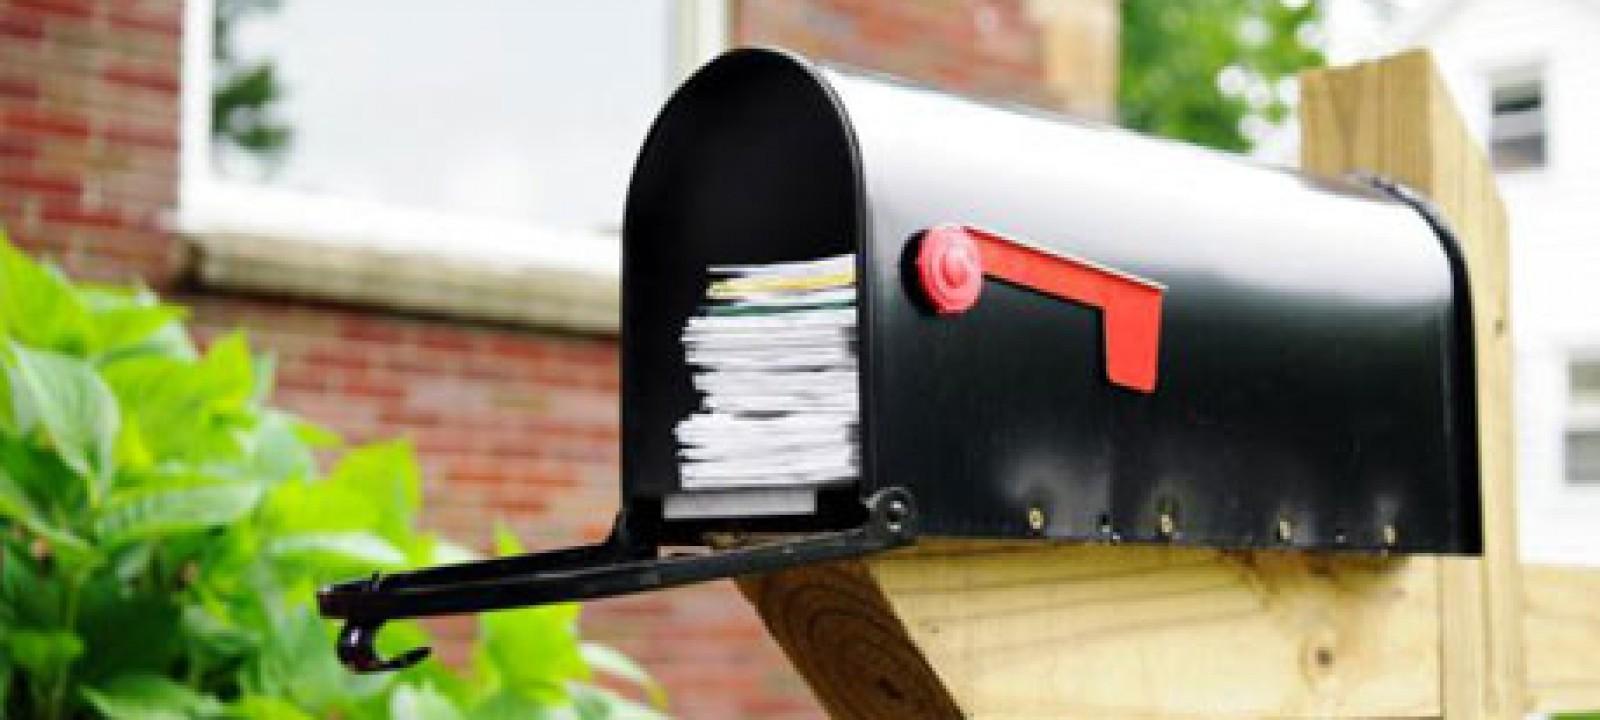 460x300_mailbox